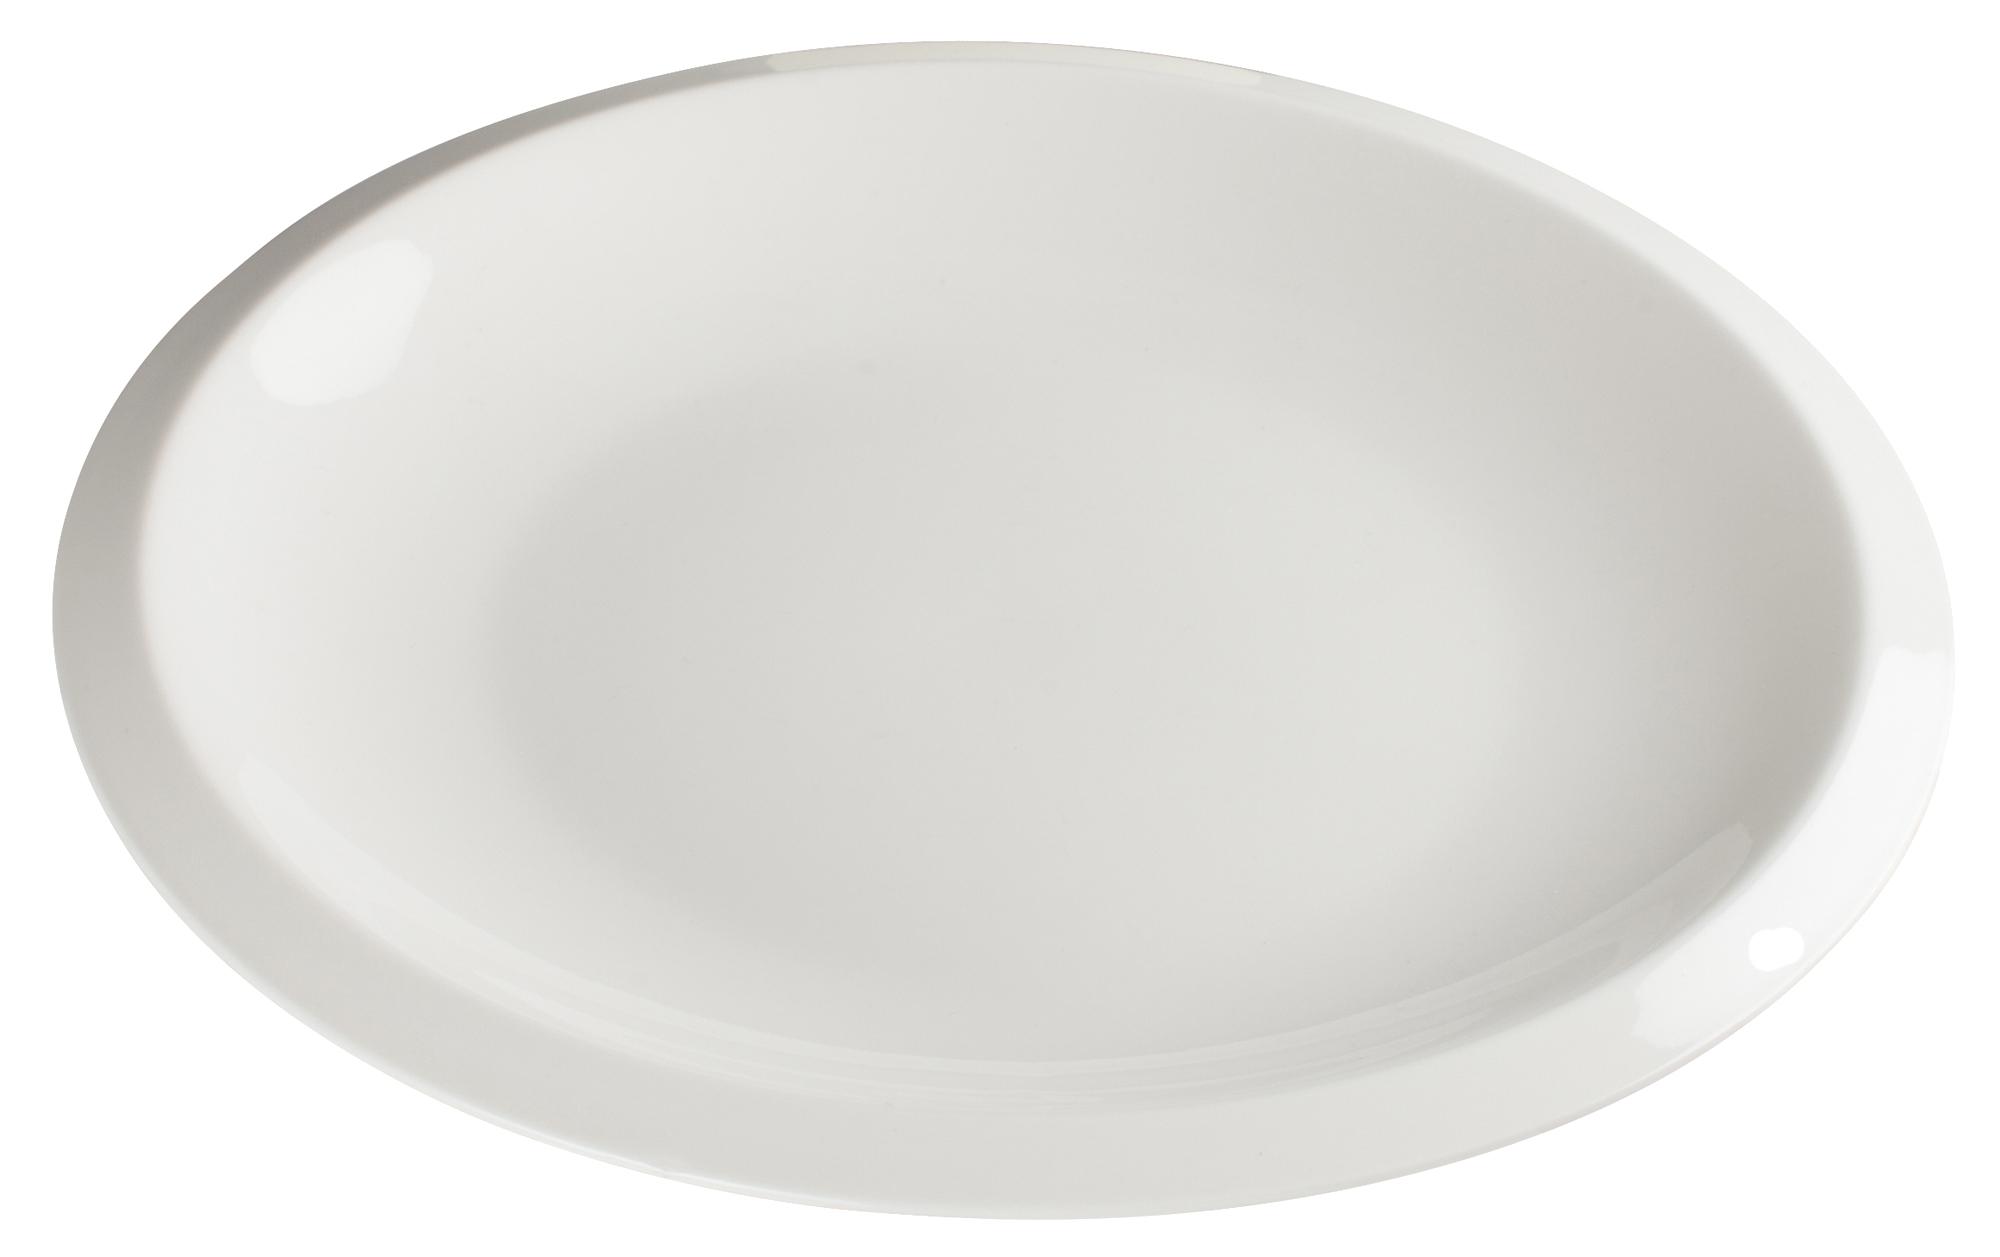 Winco WDP006-201 plate, china